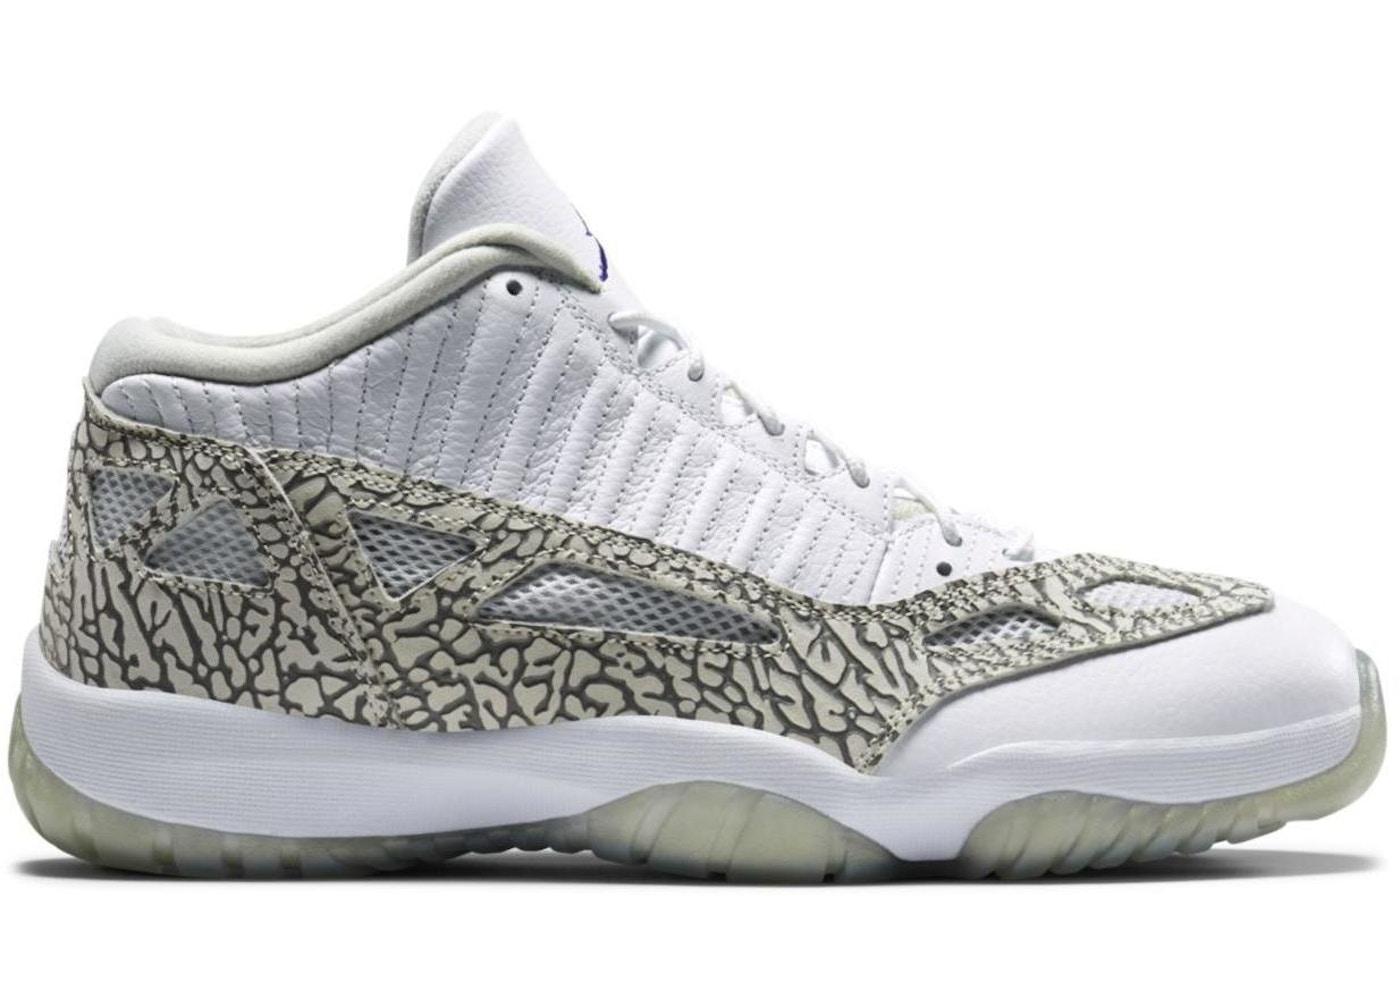 fb6d6a9fe49baa Air Jordan 11 Size 18 Shoes - Average Sale Price